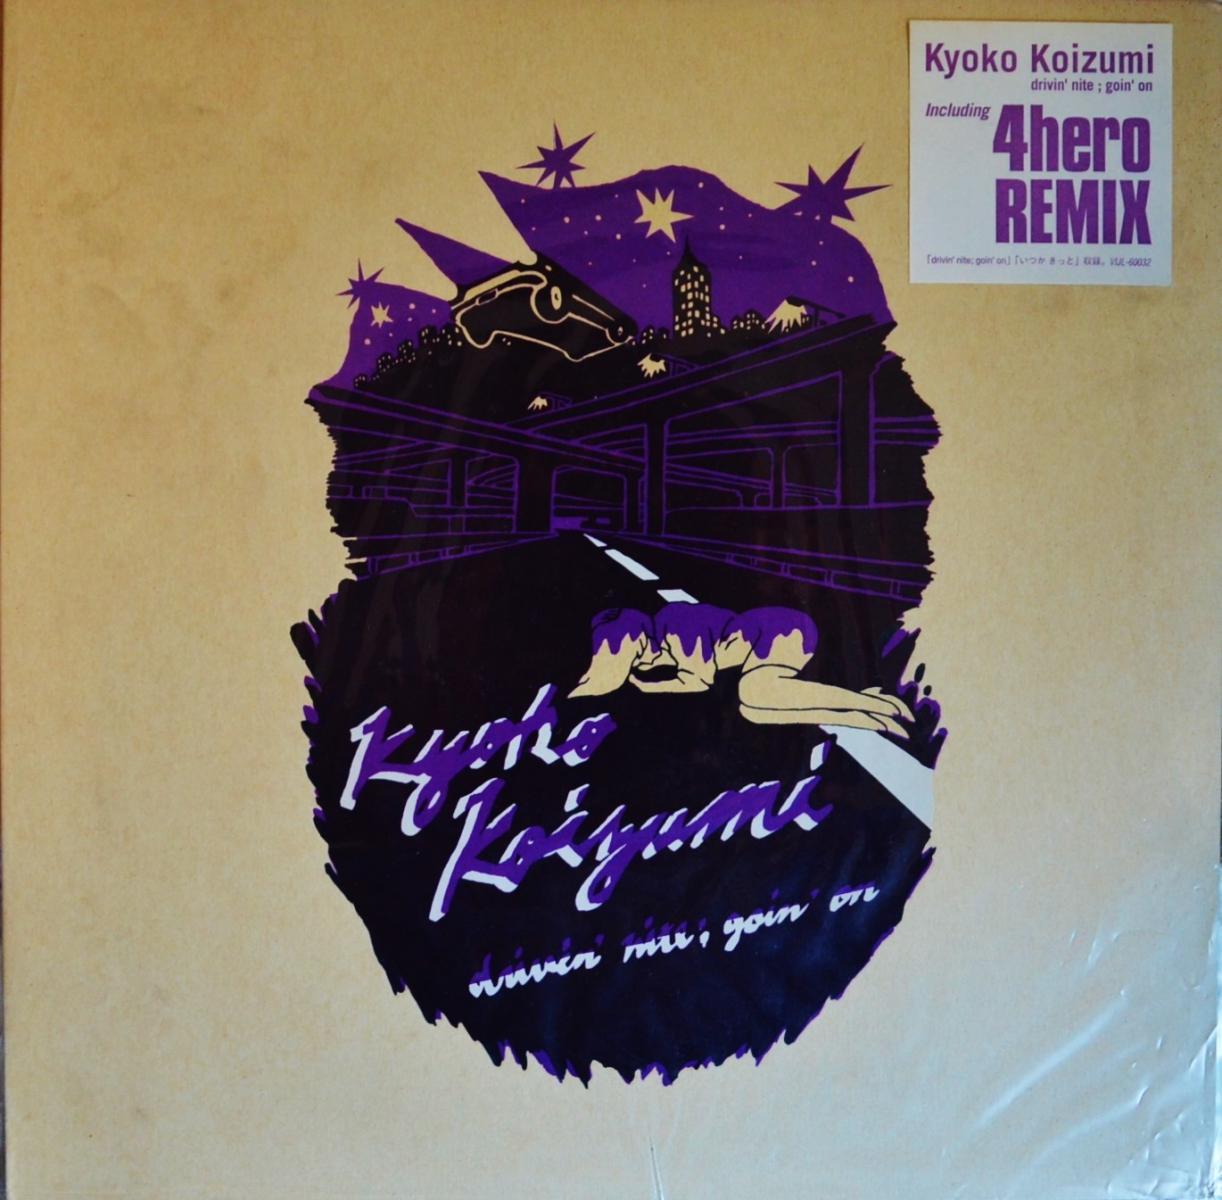 Kyoko Koizumi - Drivin' Nite ; Goin' On